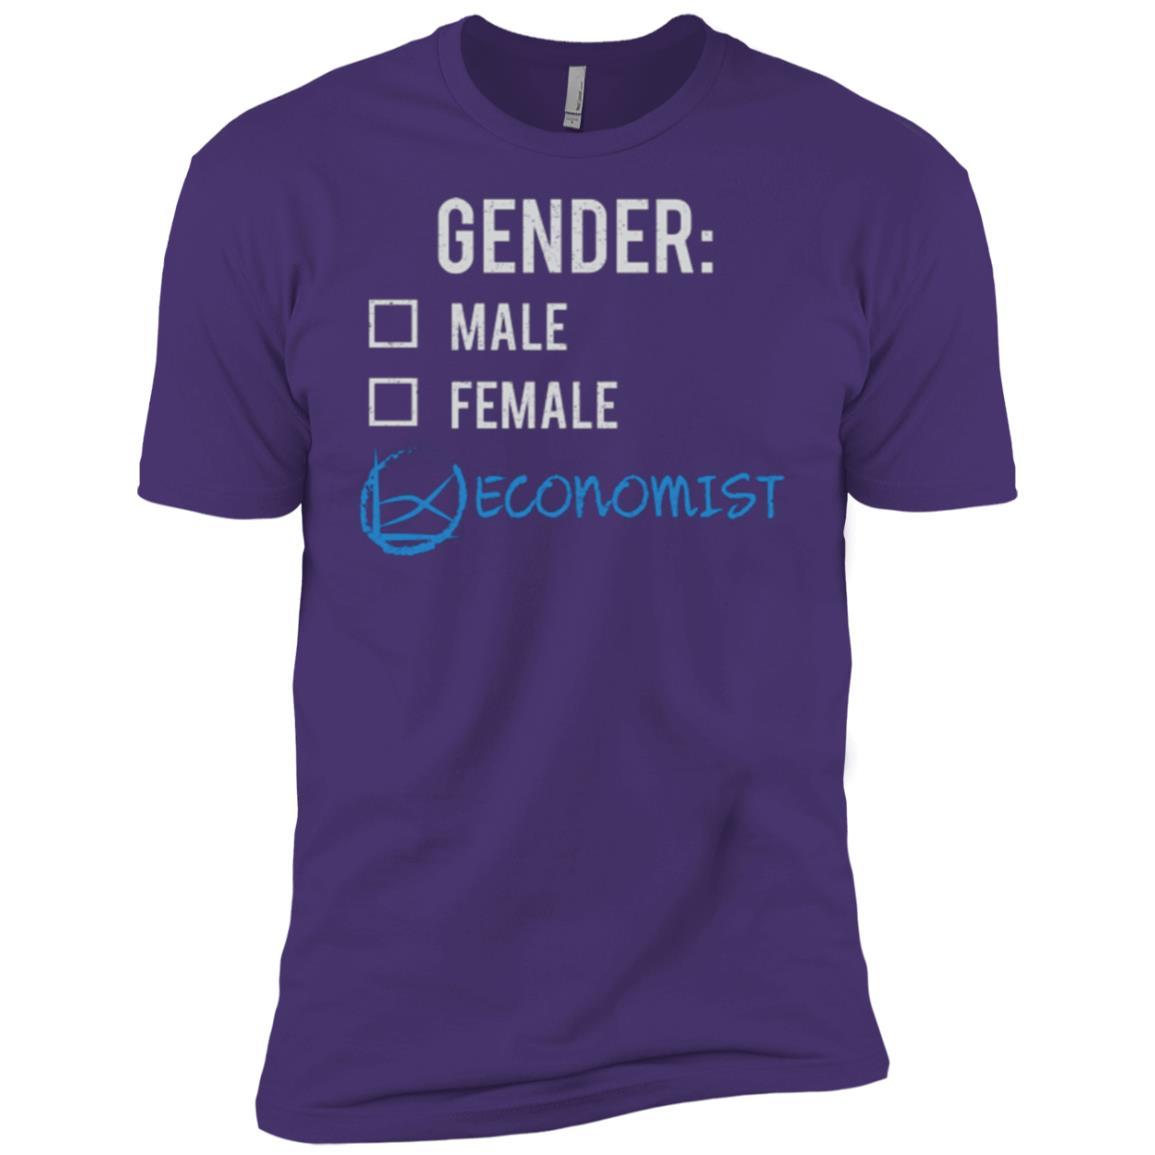 Male Female Economist Gender Nonbinary Trans Men Short Sleeve T-Shirt